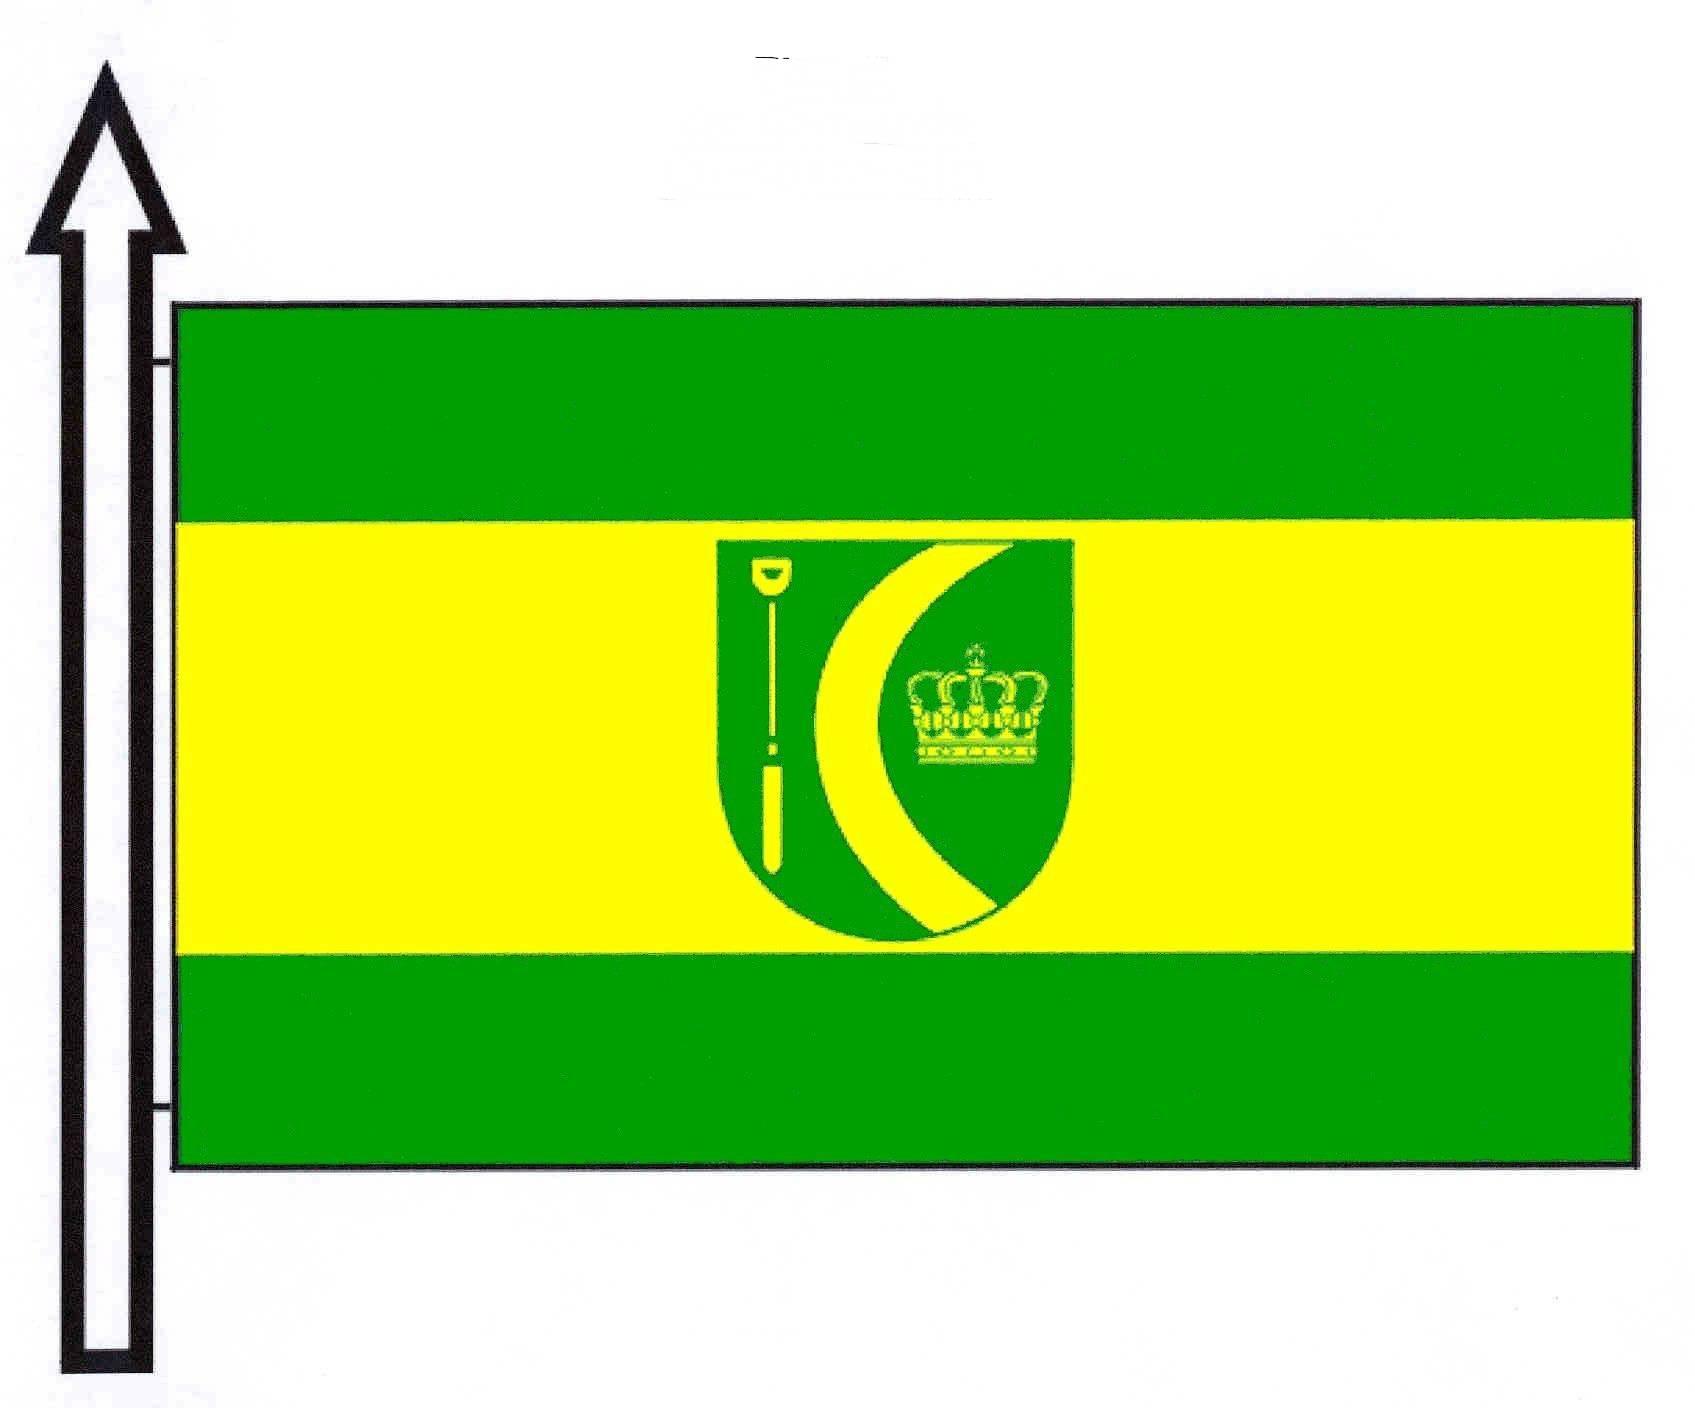 Flagge GemeindeChristiansholm, Kreis Rendsburg-Eckernförde